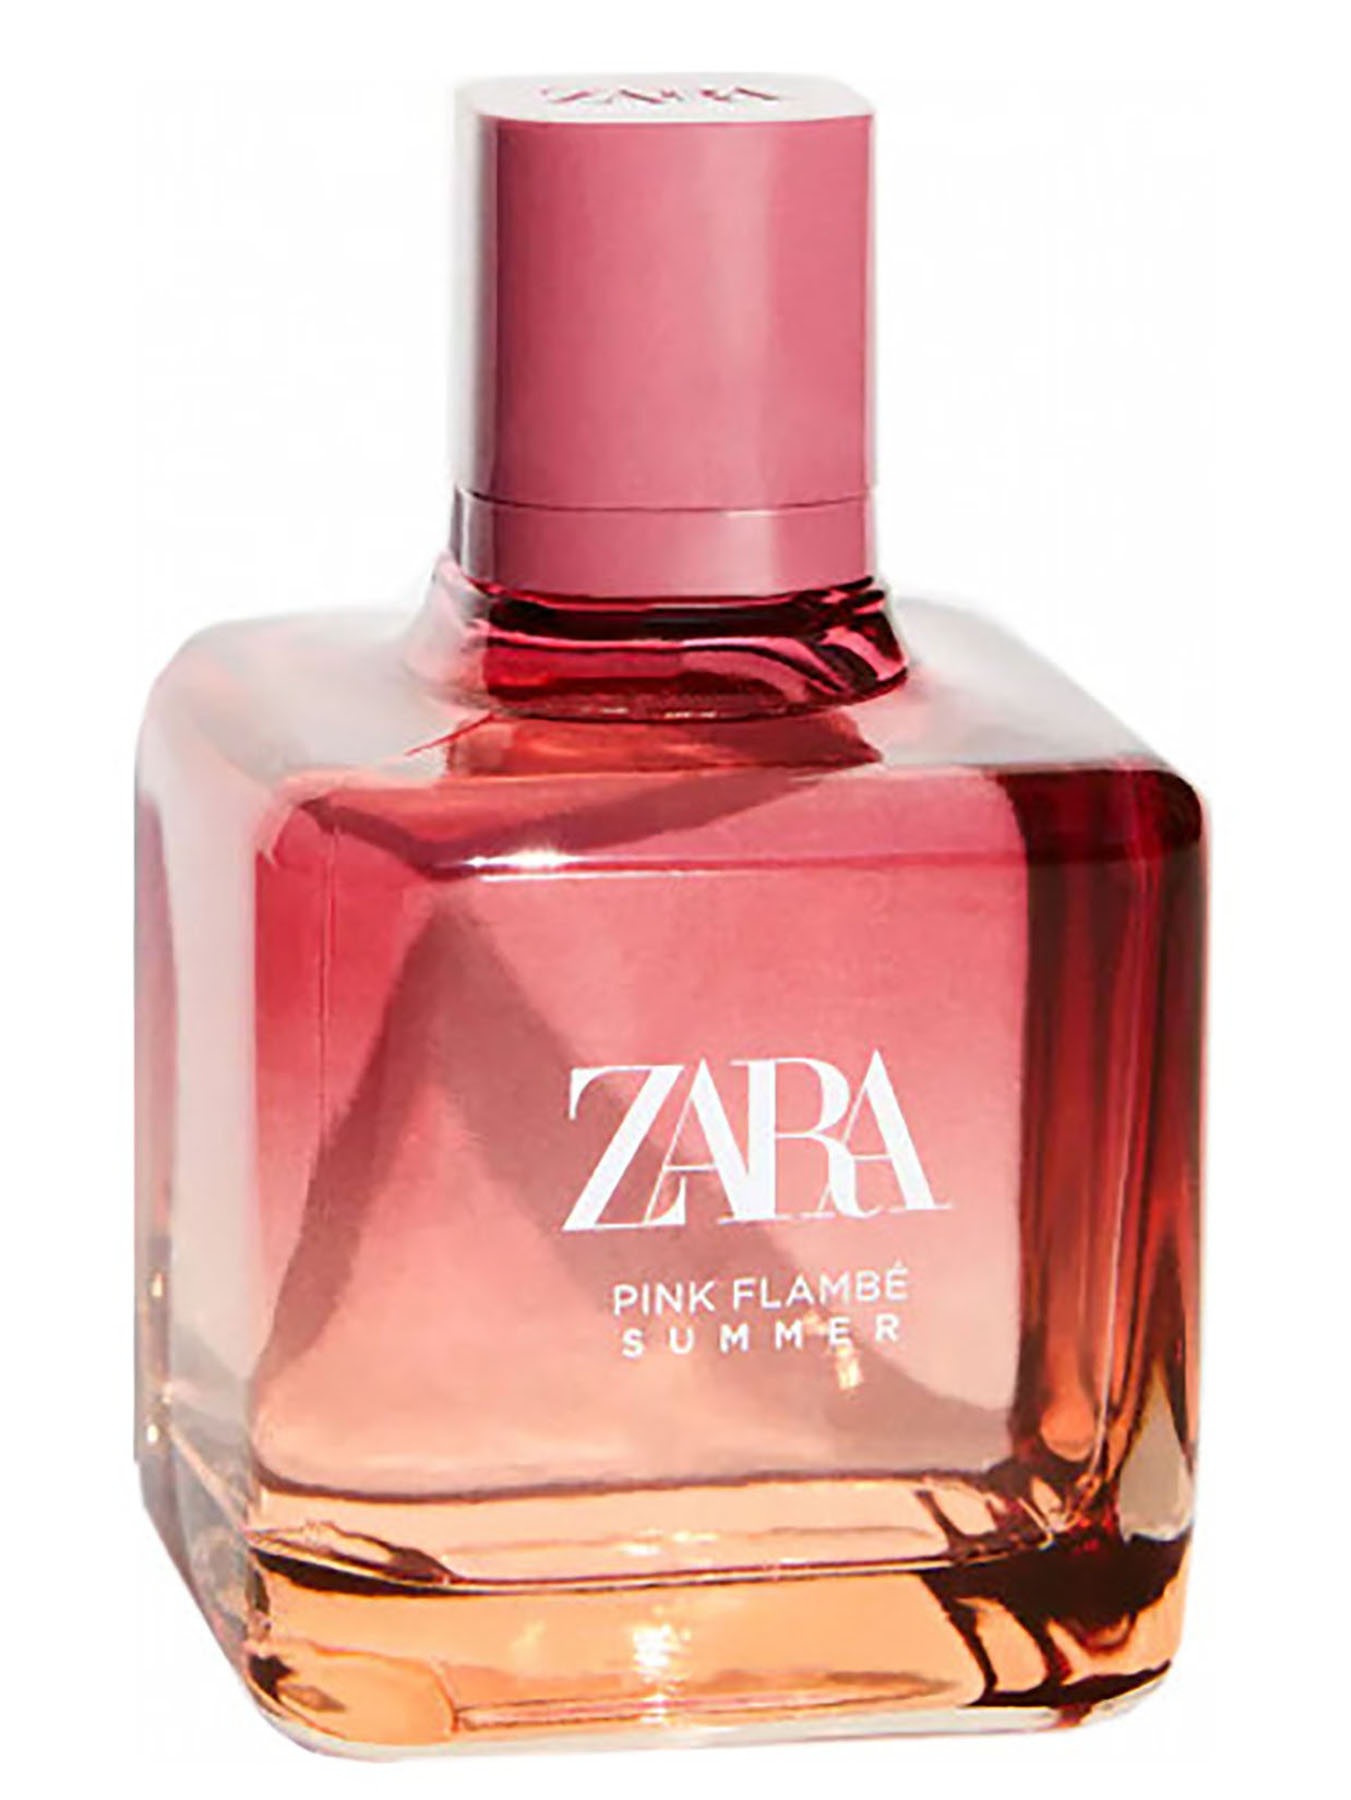 Zara Pink Flambe Summer